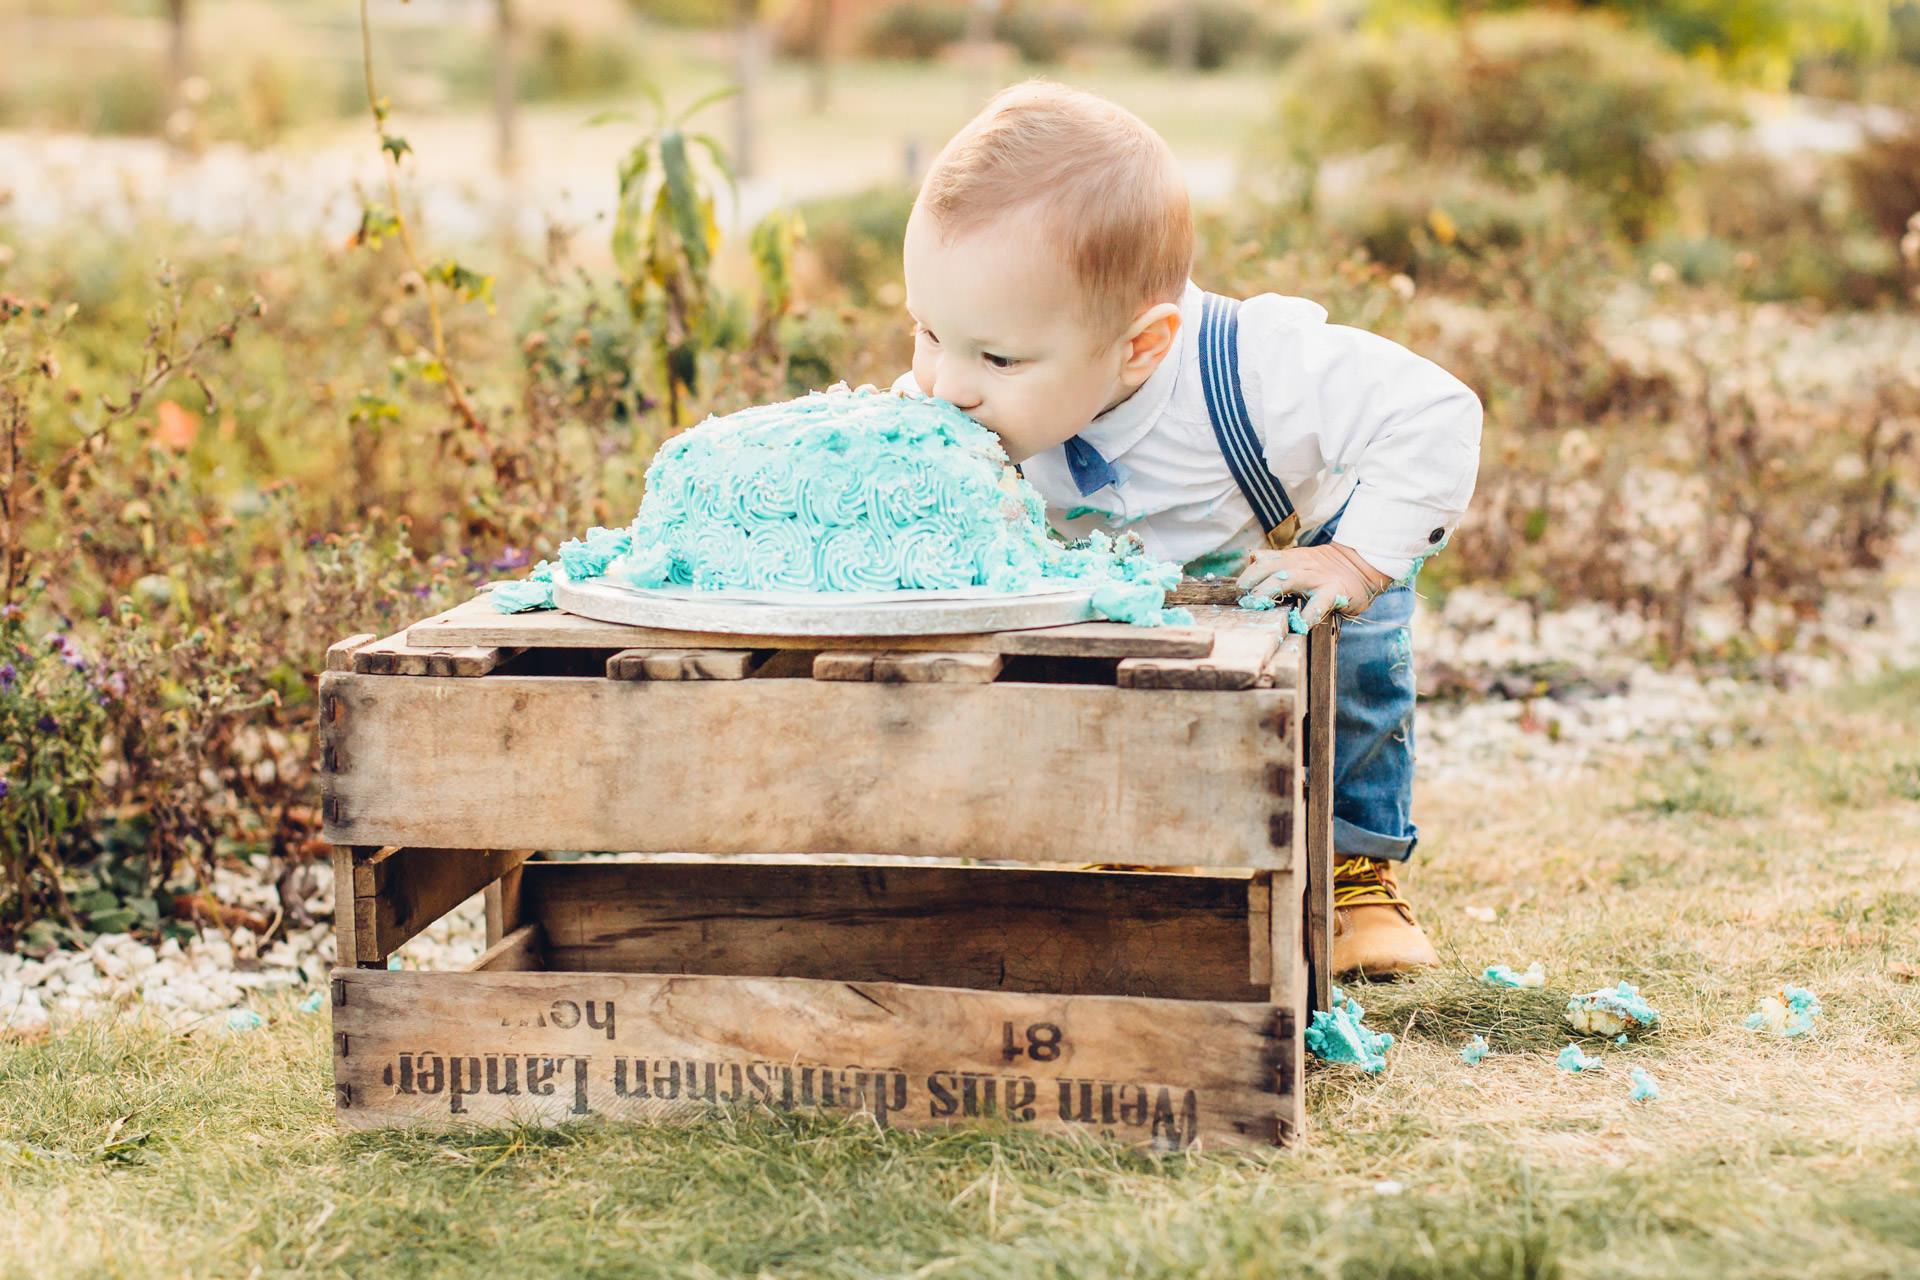 Cake Smash Fotoshooting zum 1. Geburtstag